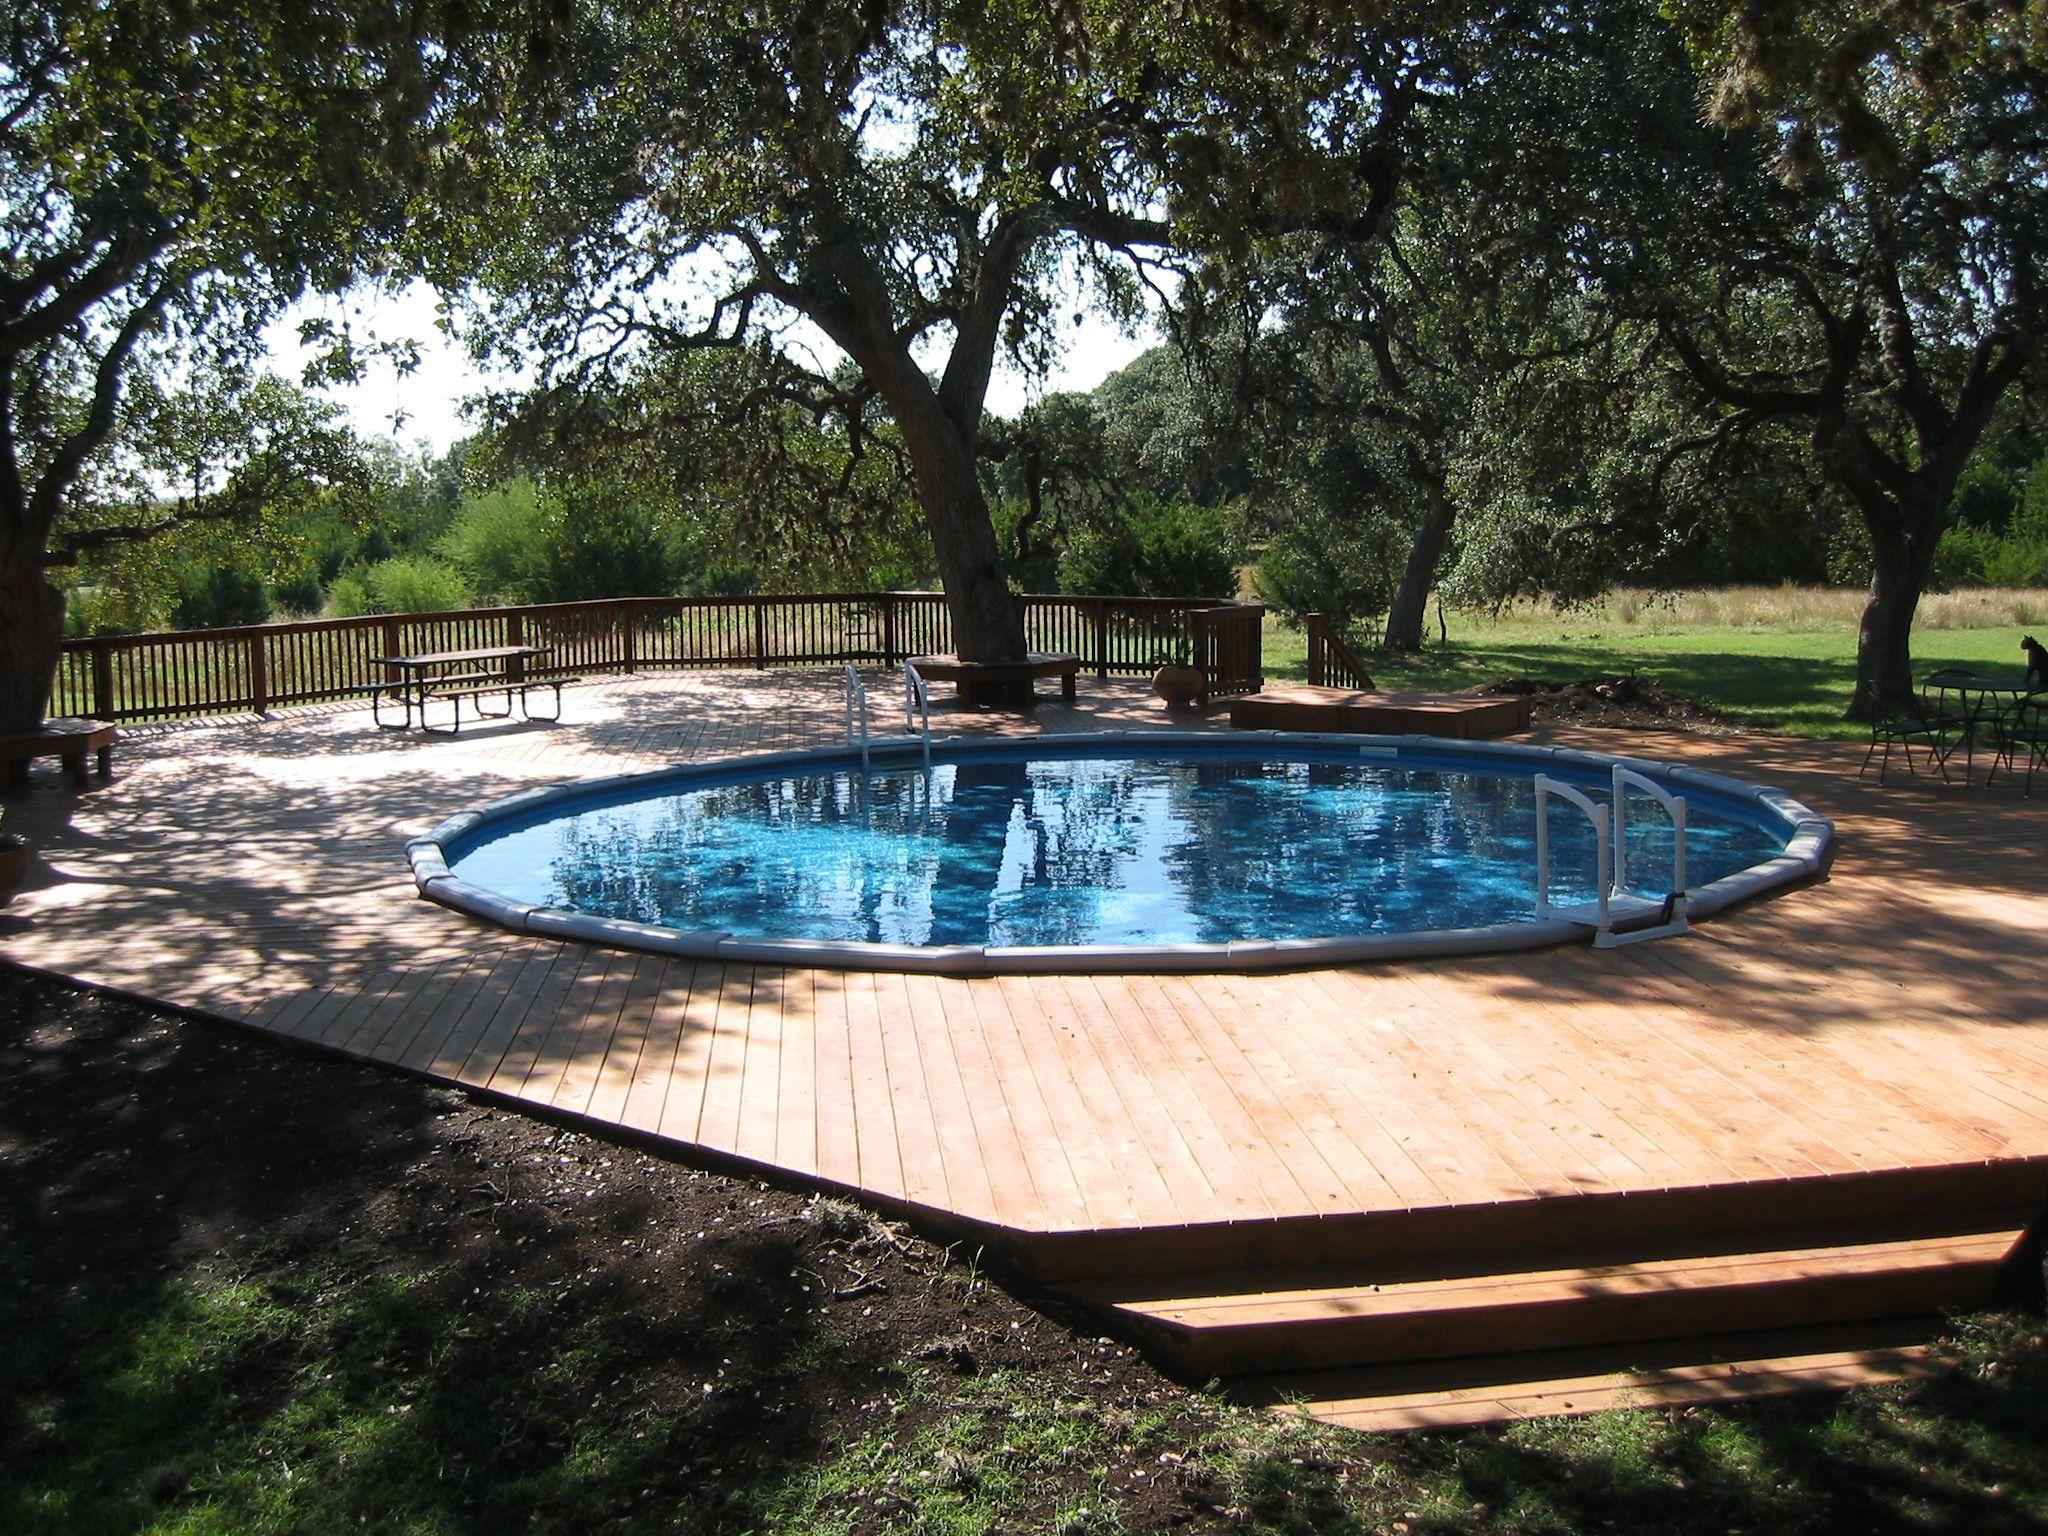 30 Round Above Ground Pool In San Antonio Texas Above